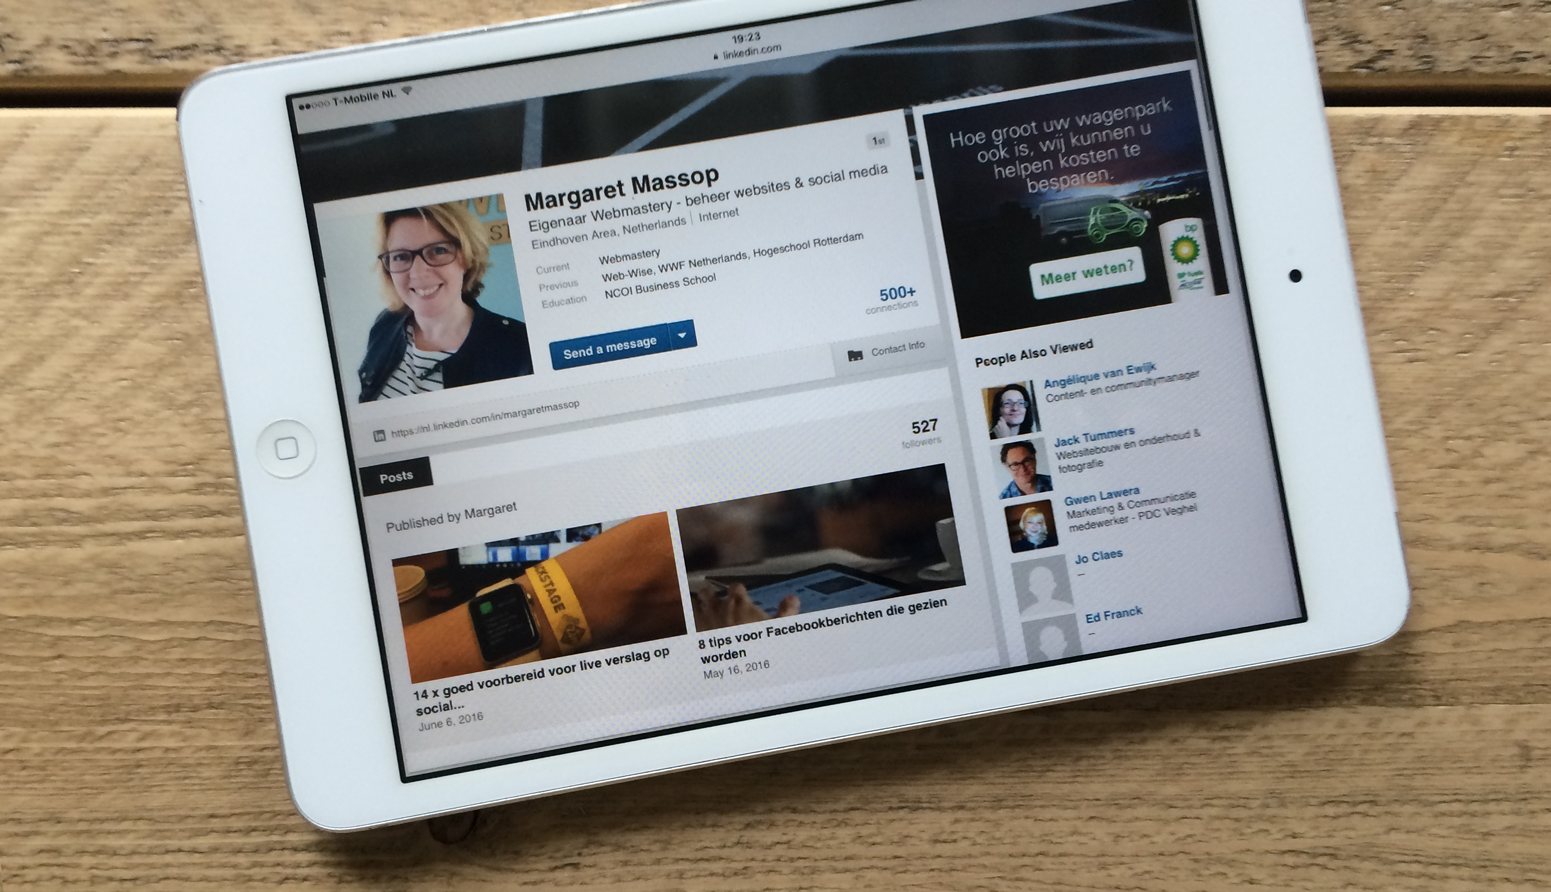 Linkedin profiel Margaret Massop